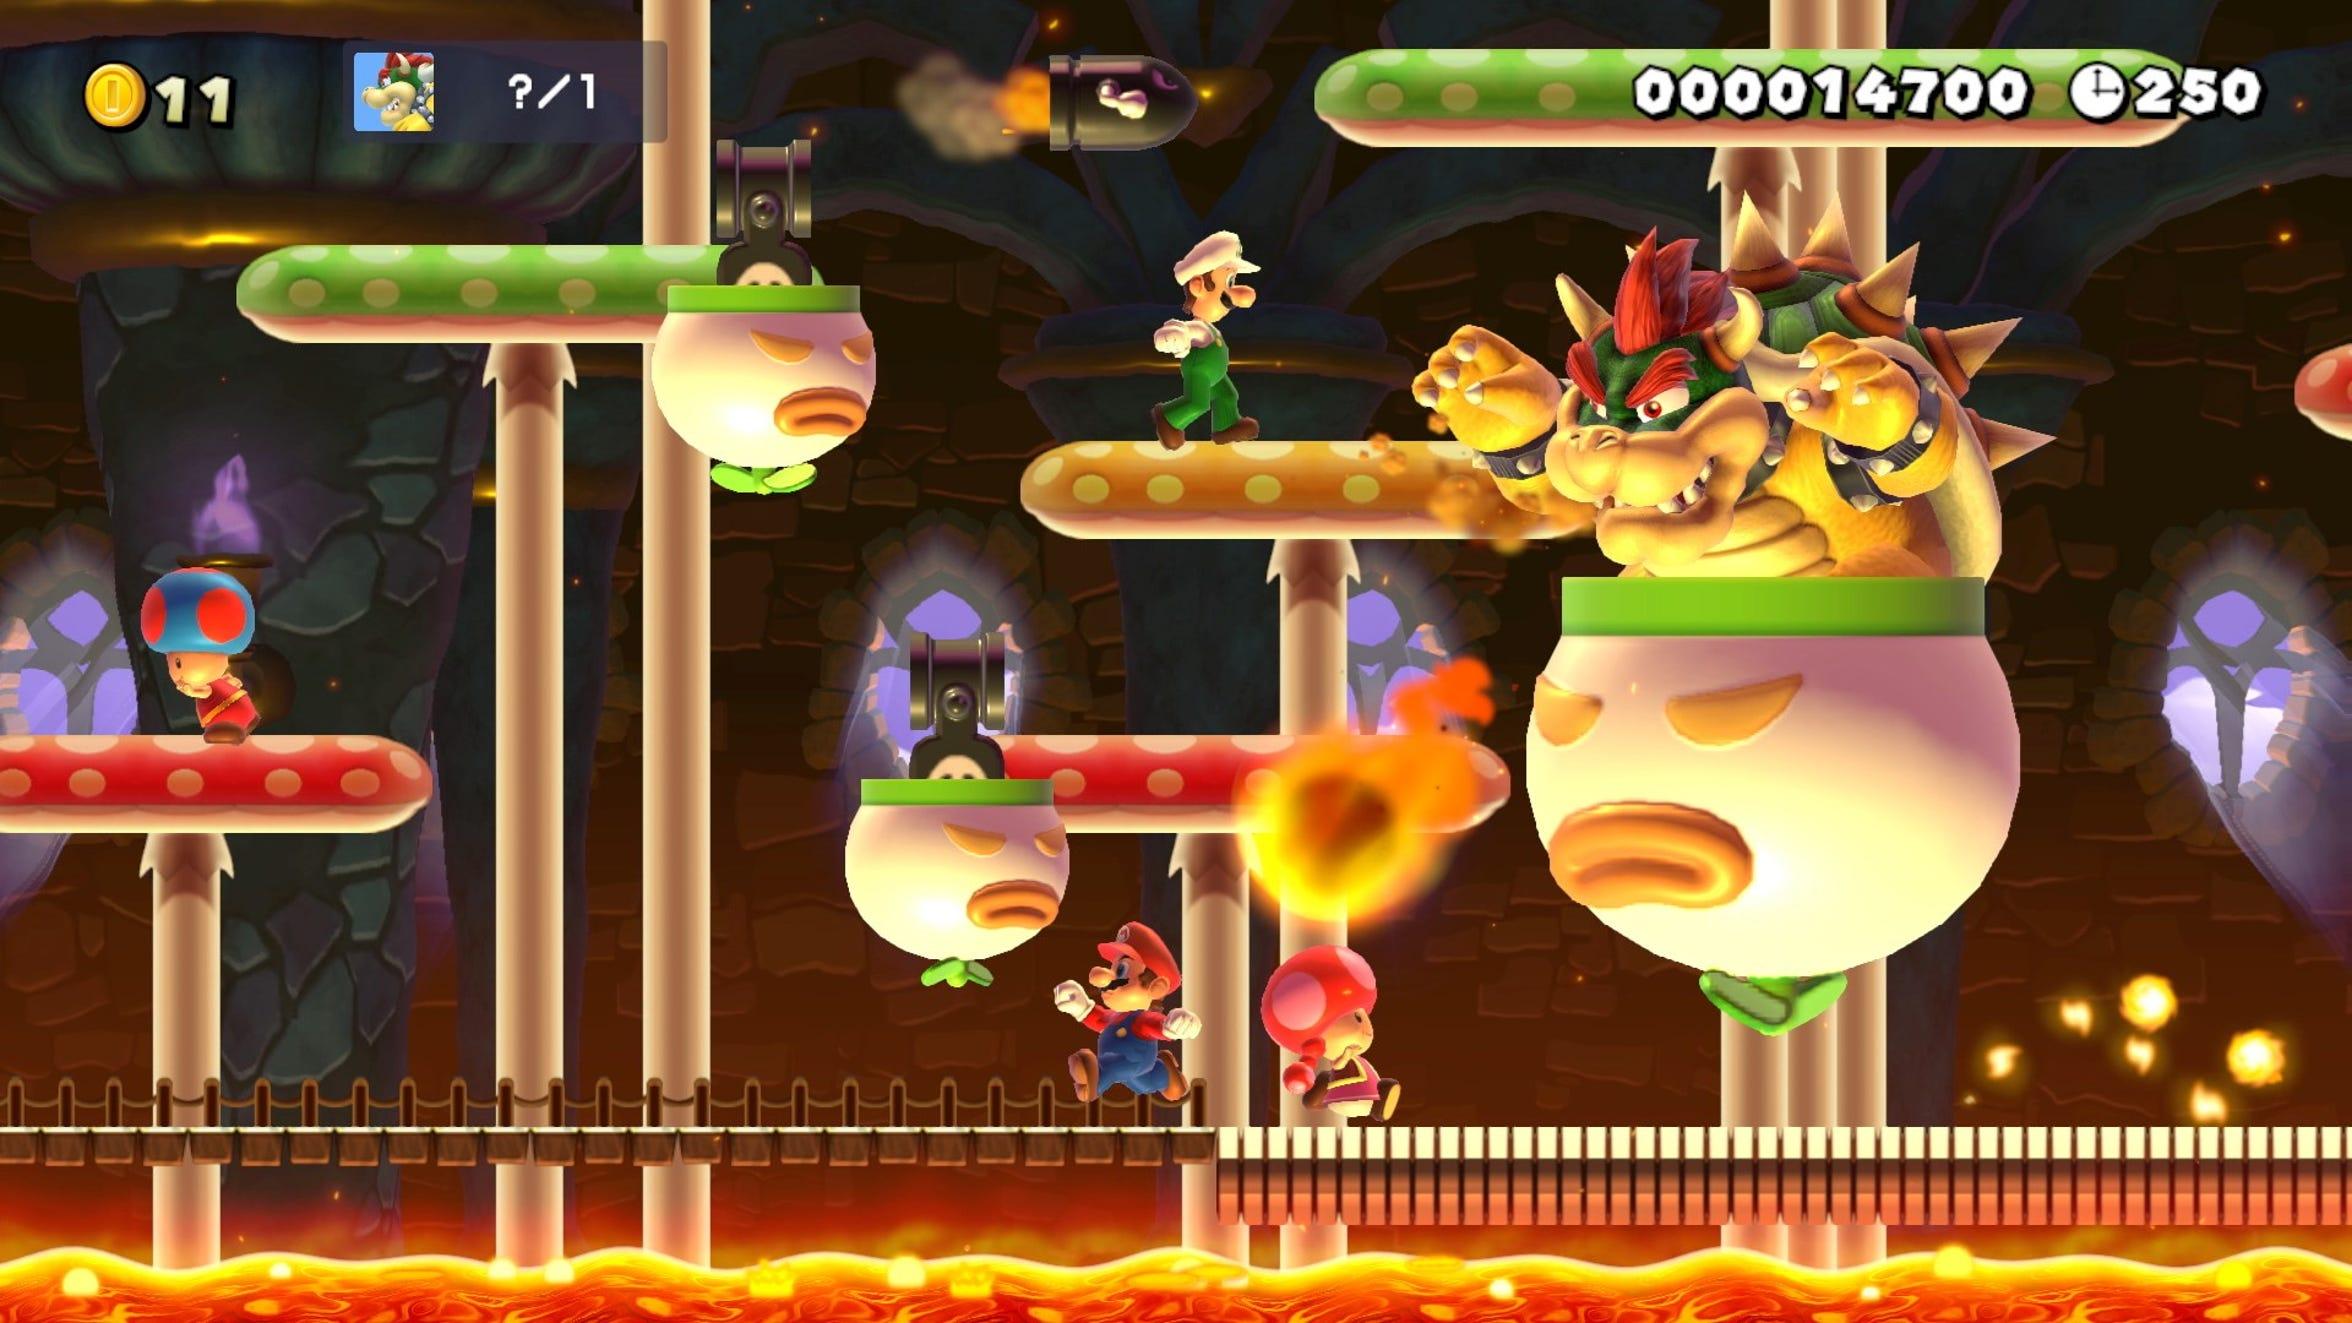 Super Mario Maker 2 for Nintendo Switch.